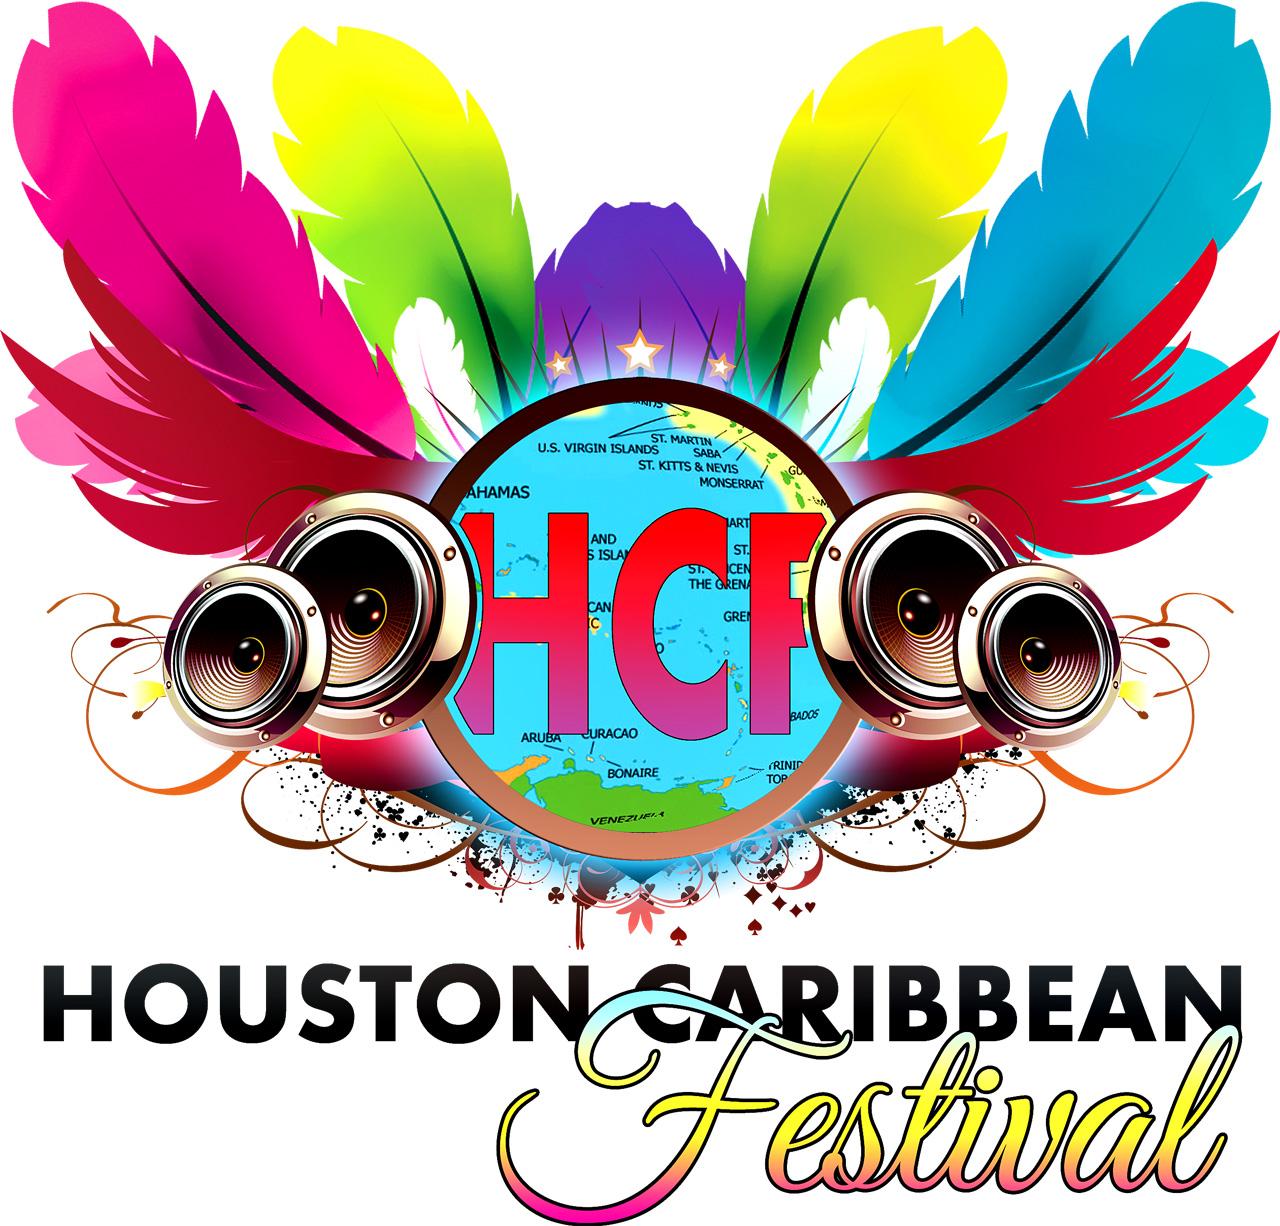 Carneval clipart caribbean carnival S Caribbean 2014 HCF Houston